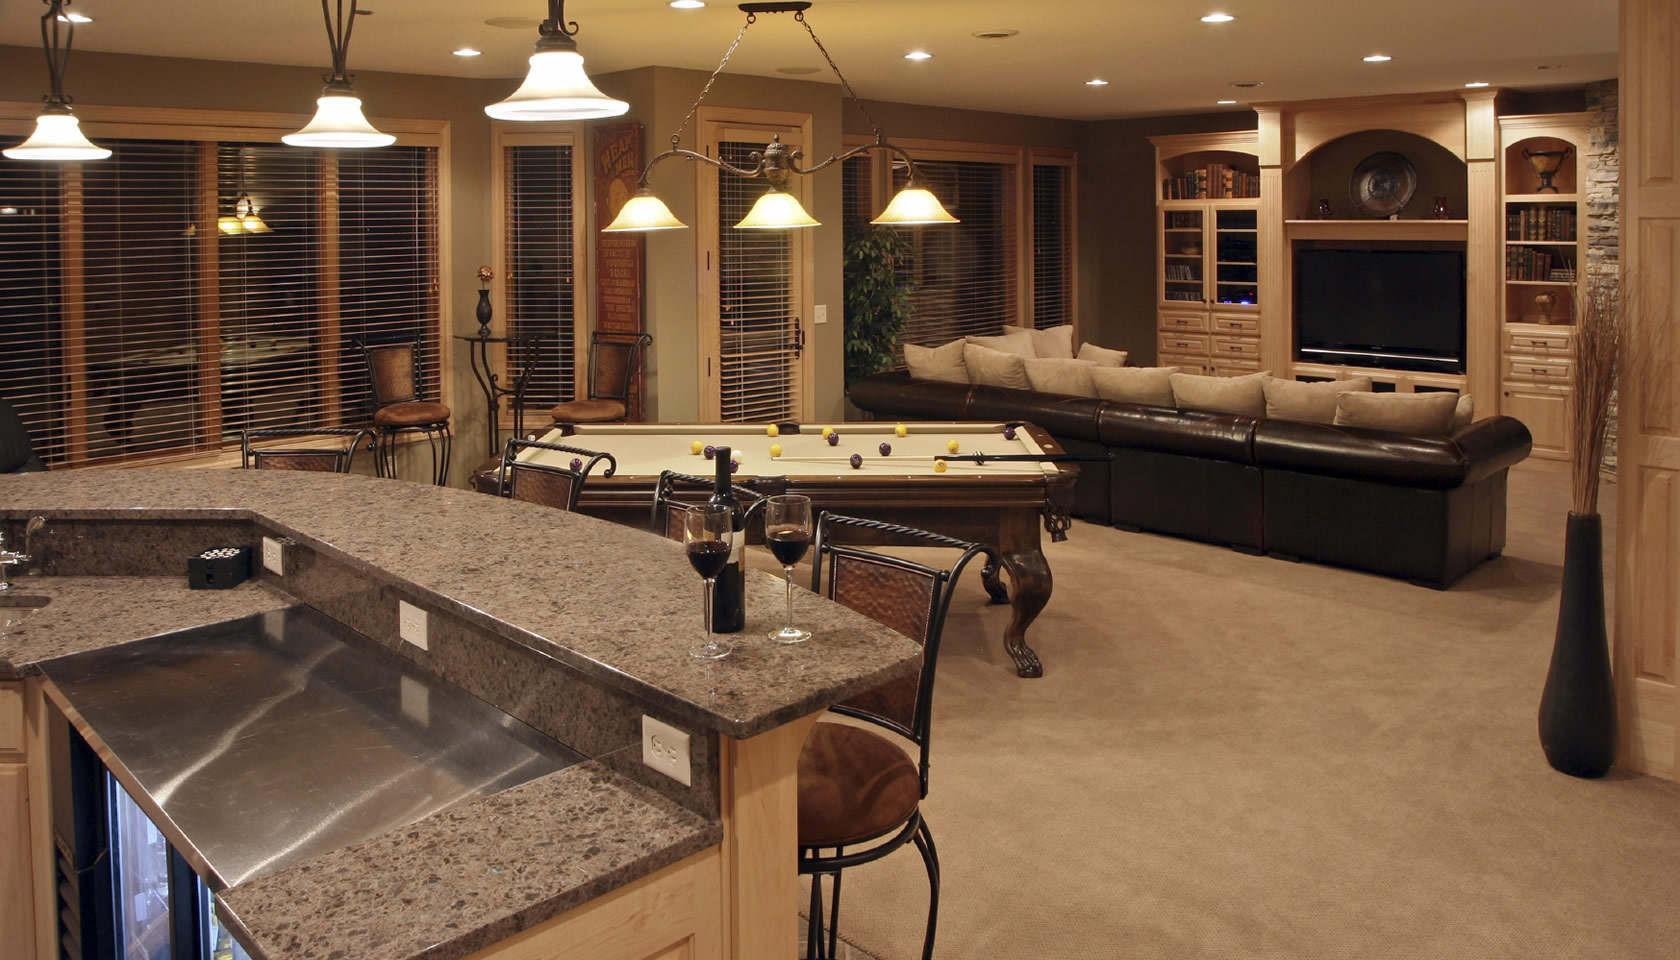 Best ideas about Finishing A Basement Ideas . Save or Pin Basement Finishing Ideas with Stunning Interior Designs Now.